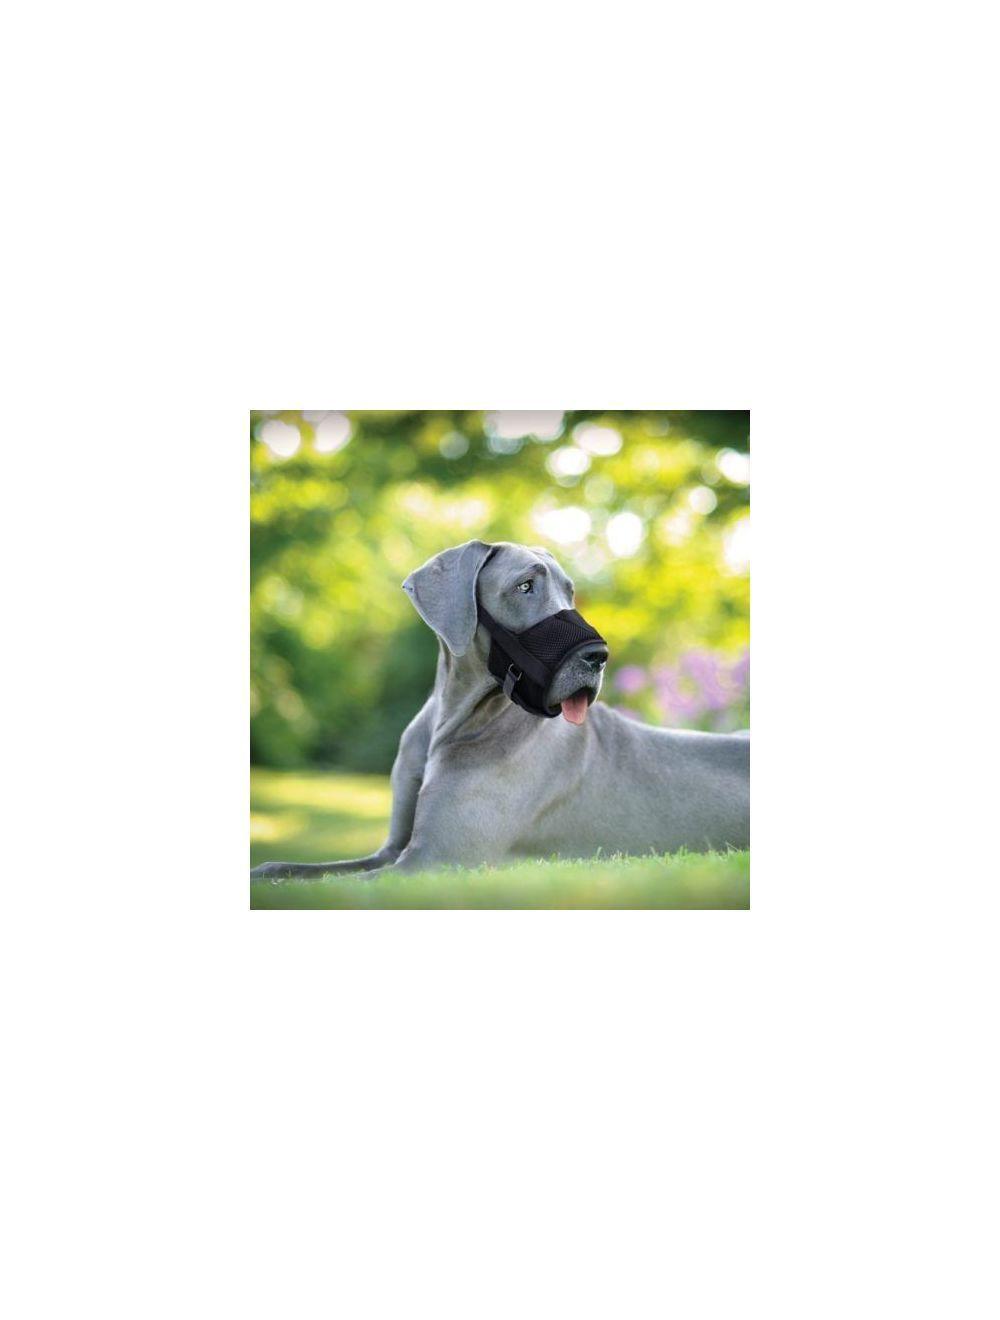 Coastal perro bozal comfort small - Ciudaddemascotas.com